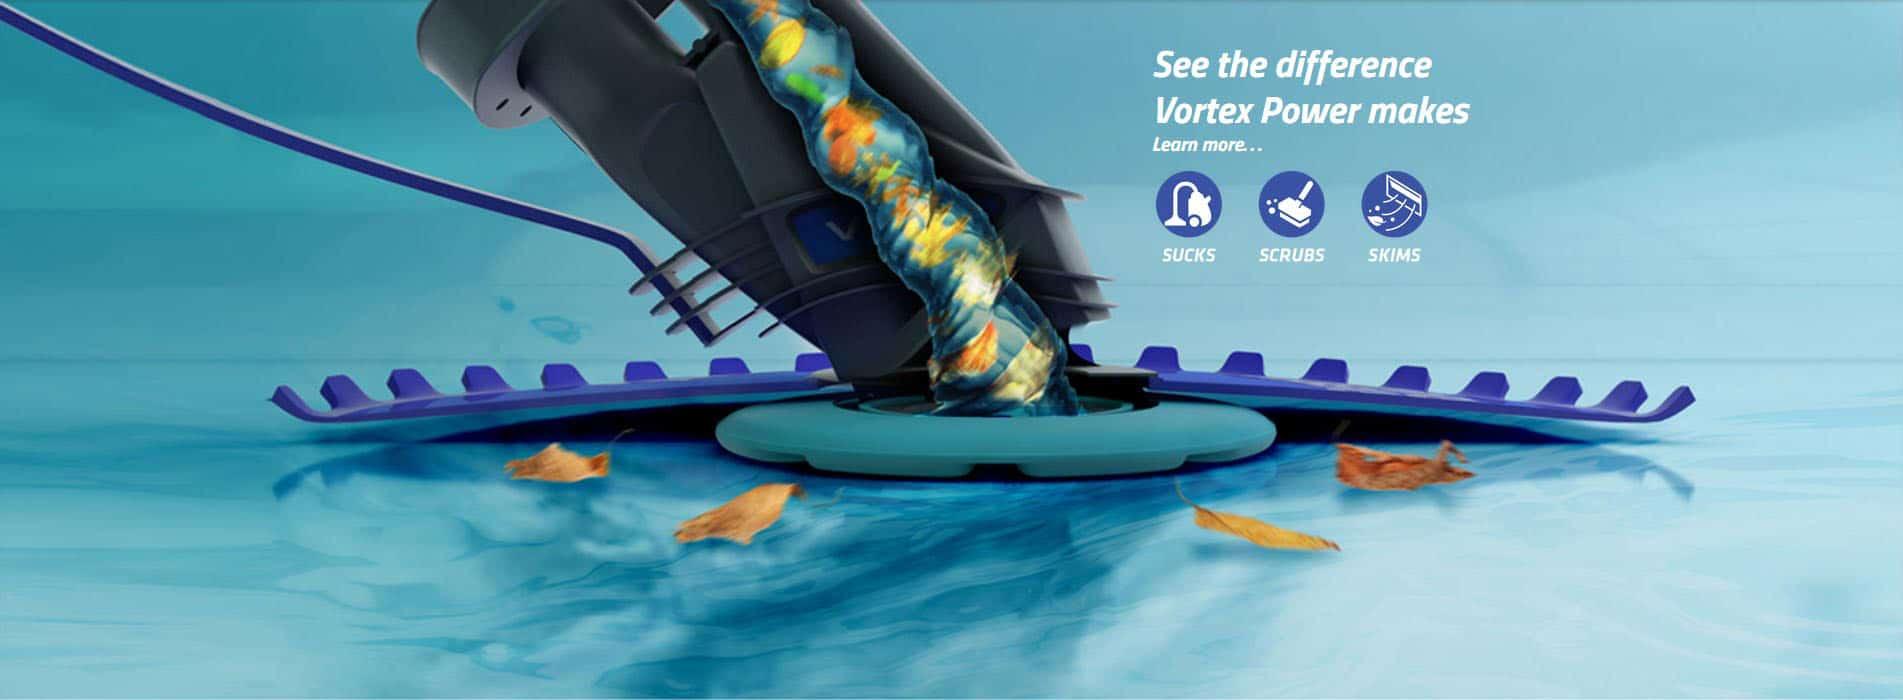 VTX 7 Vortex Pool Cleaner